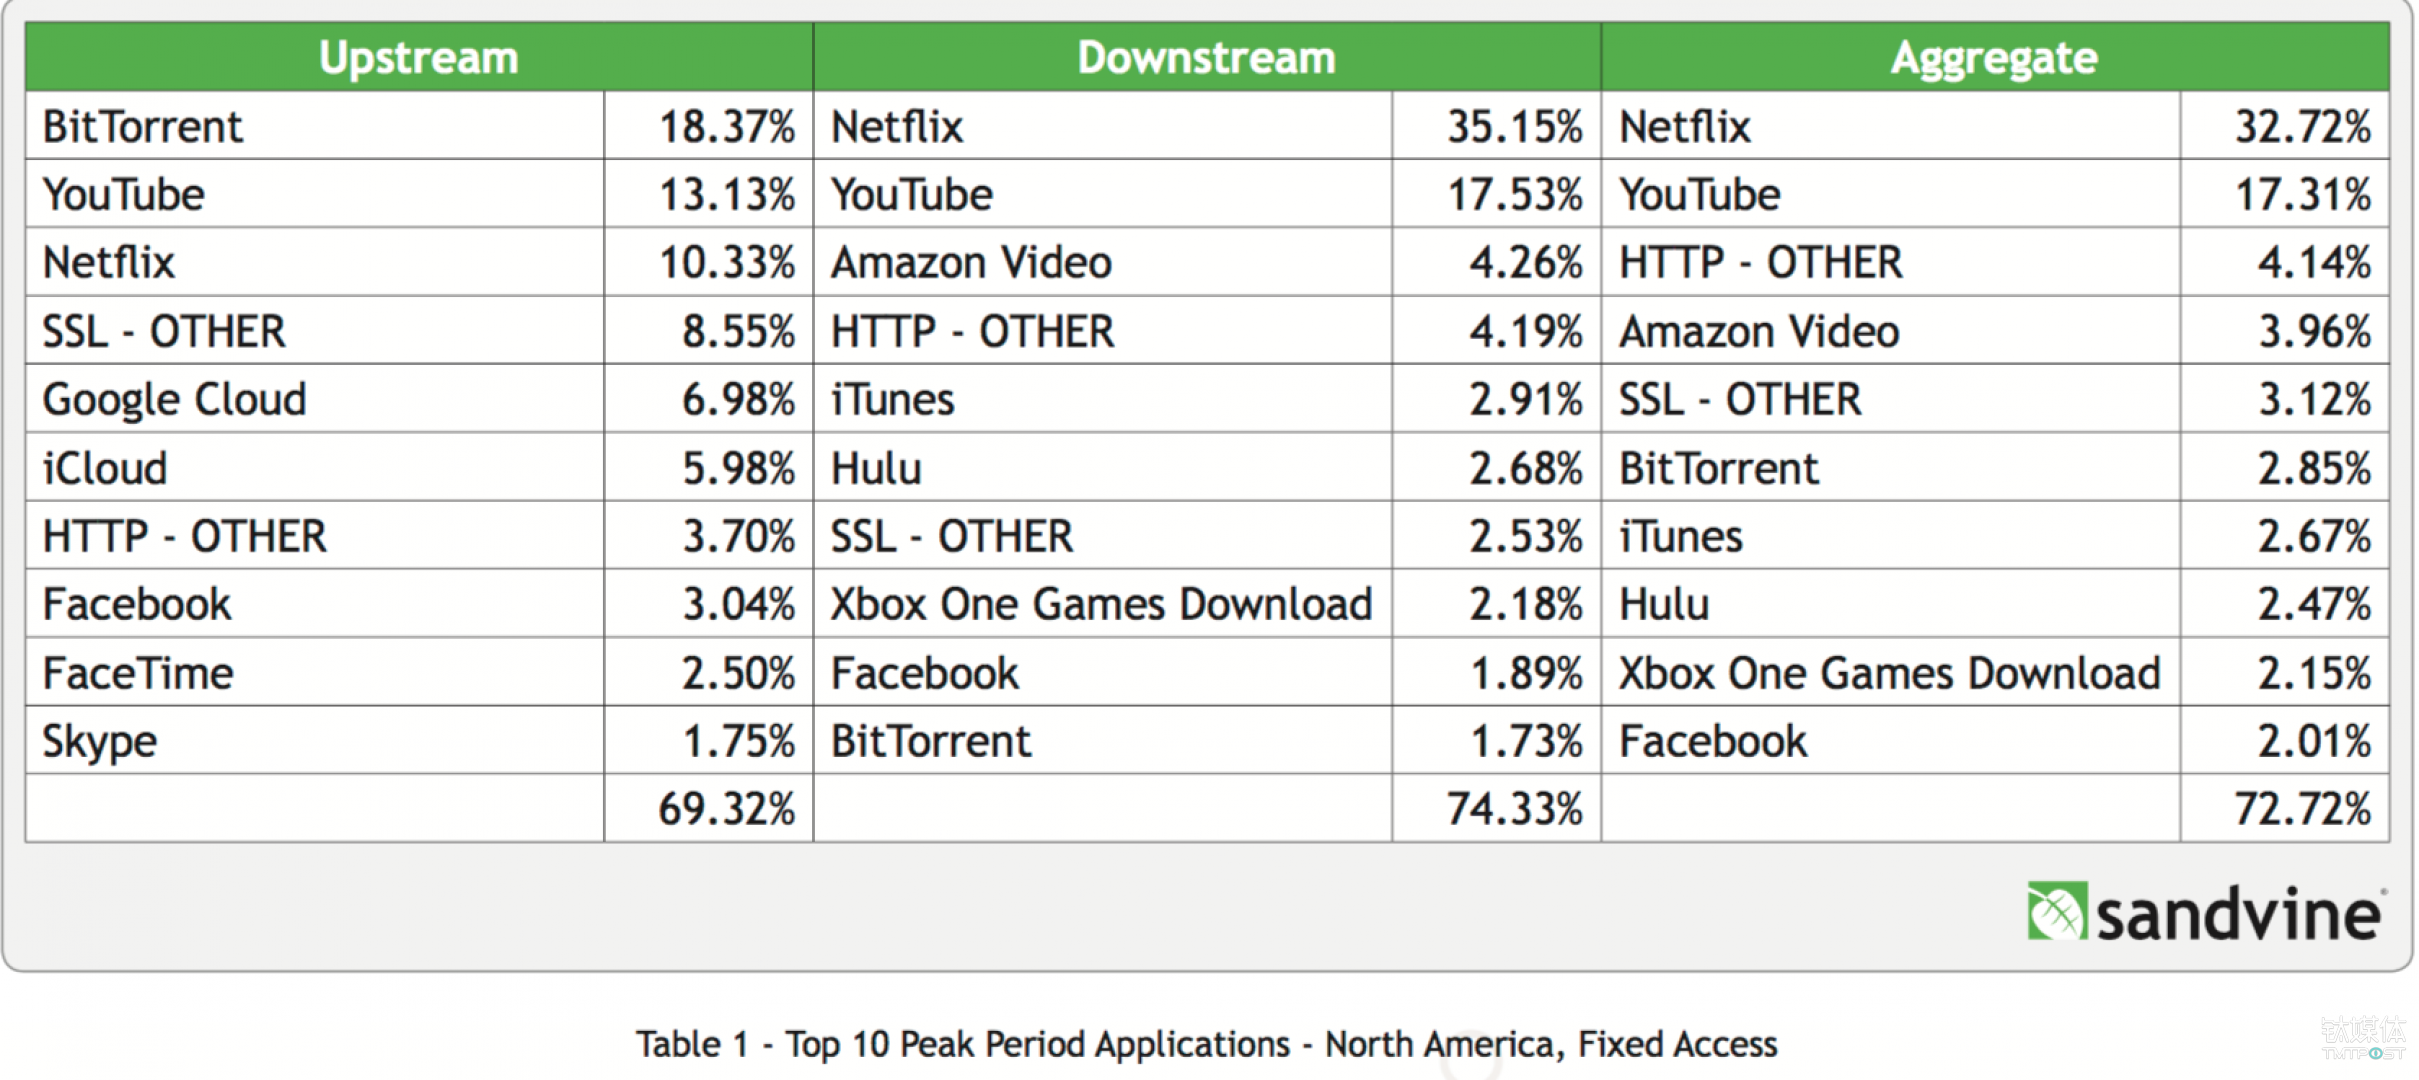 BitTorrent 已经渐渐成为明日黄花 来源:Sandvine